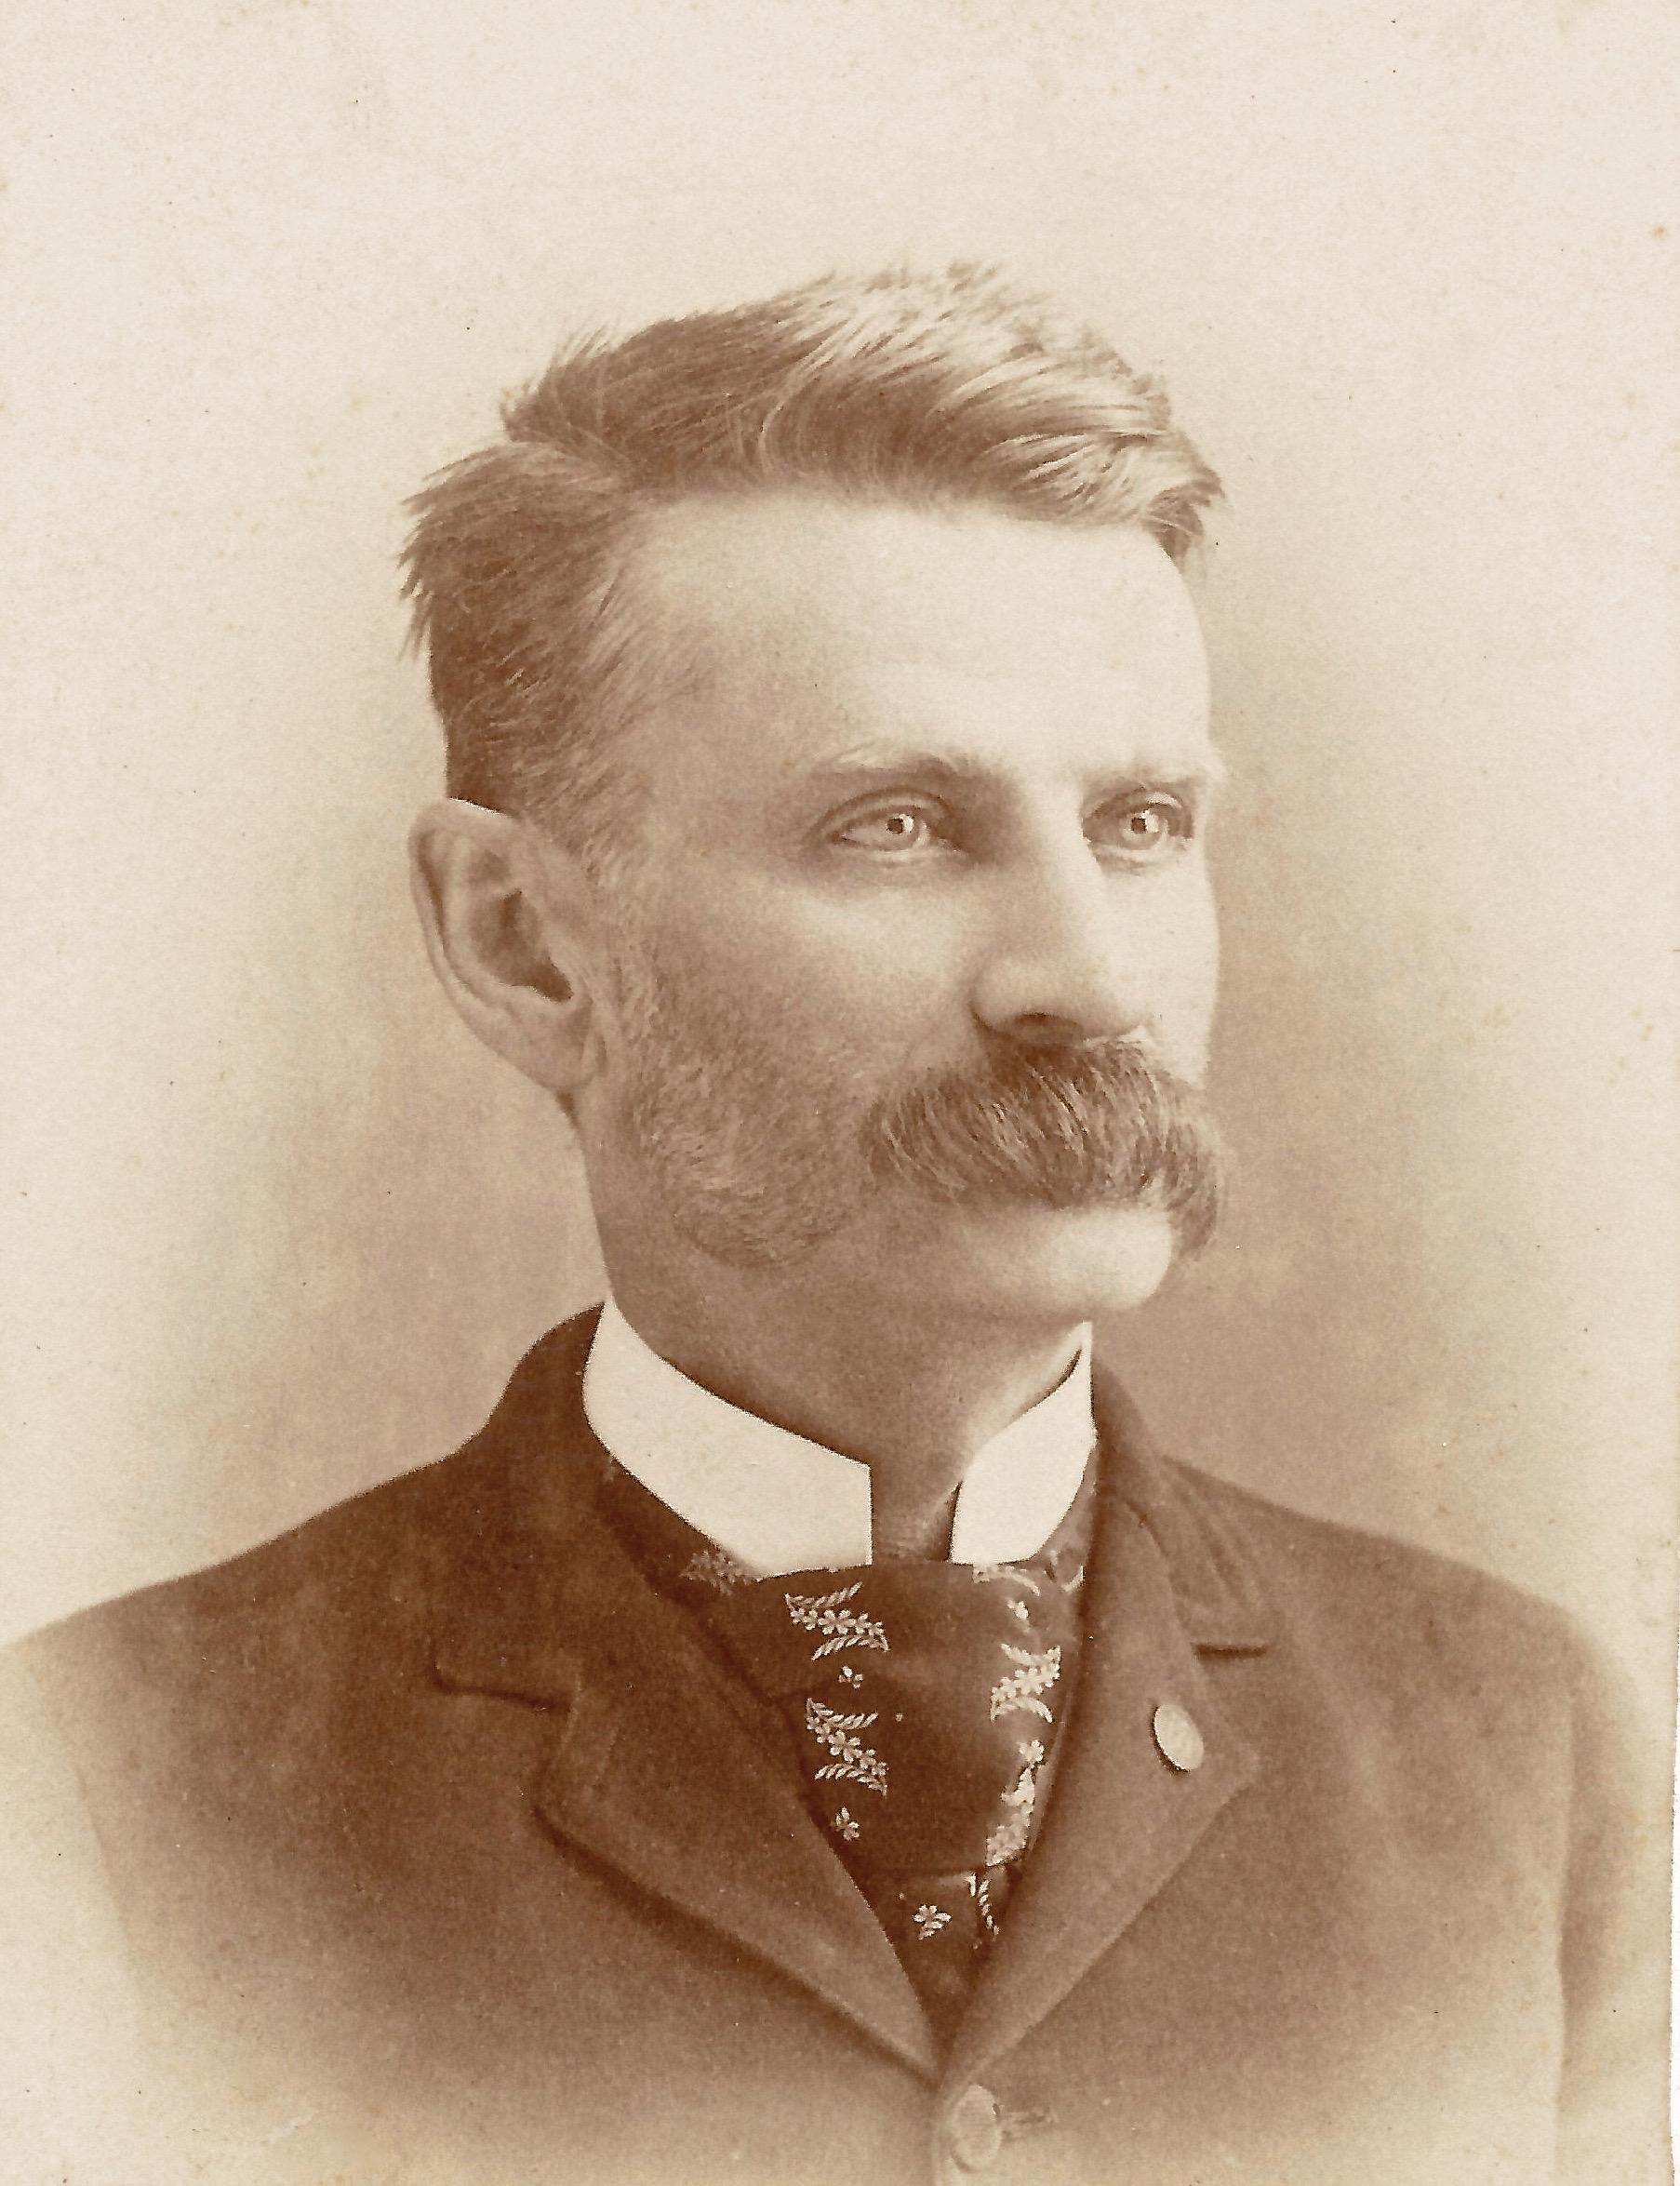 James Howard Lowell, 1890s